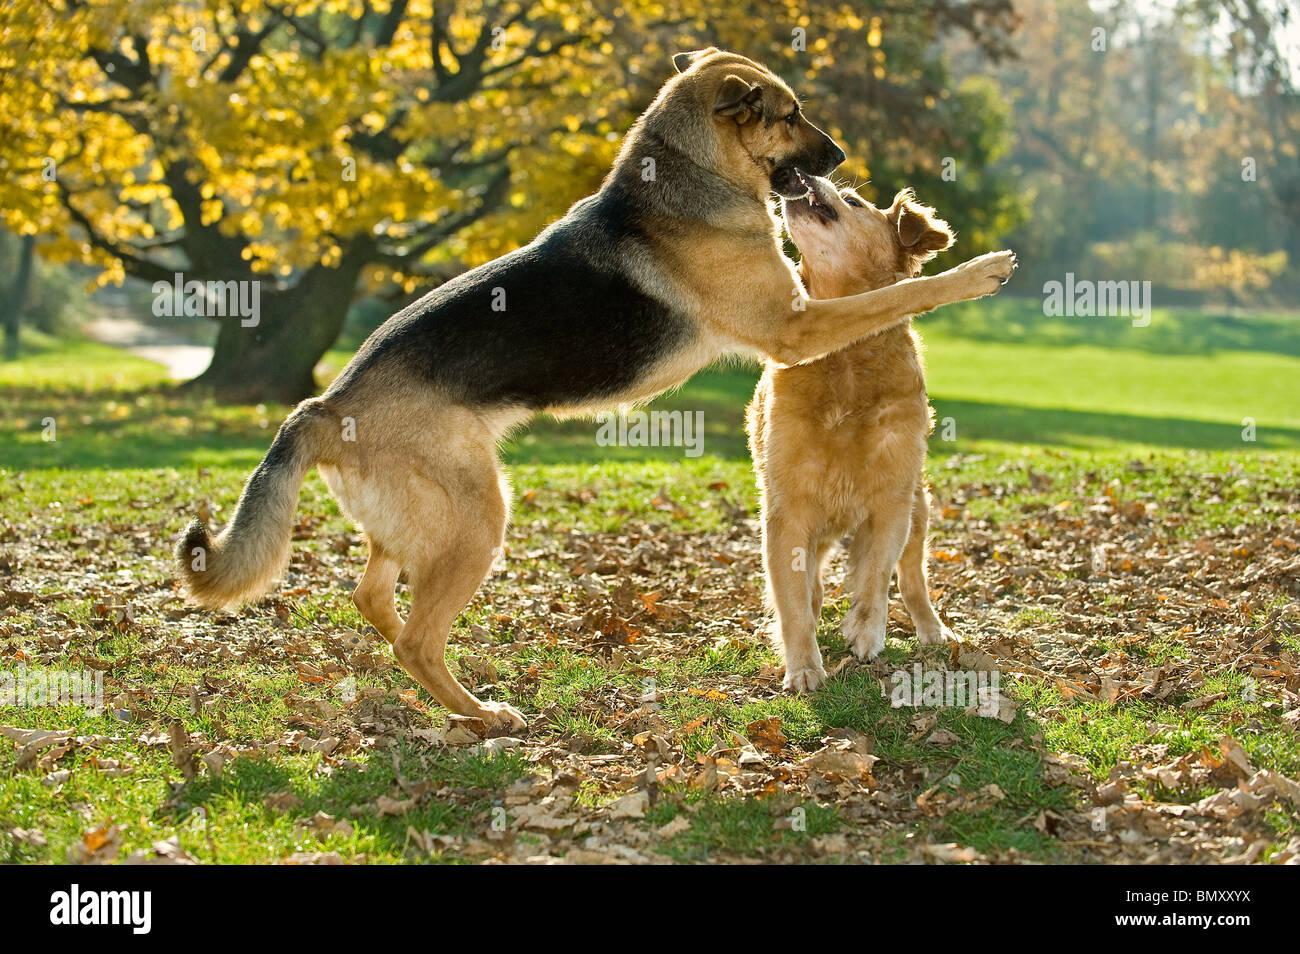 German Shepherd Dog Golden Retriever Playing Stock Photo 30095406